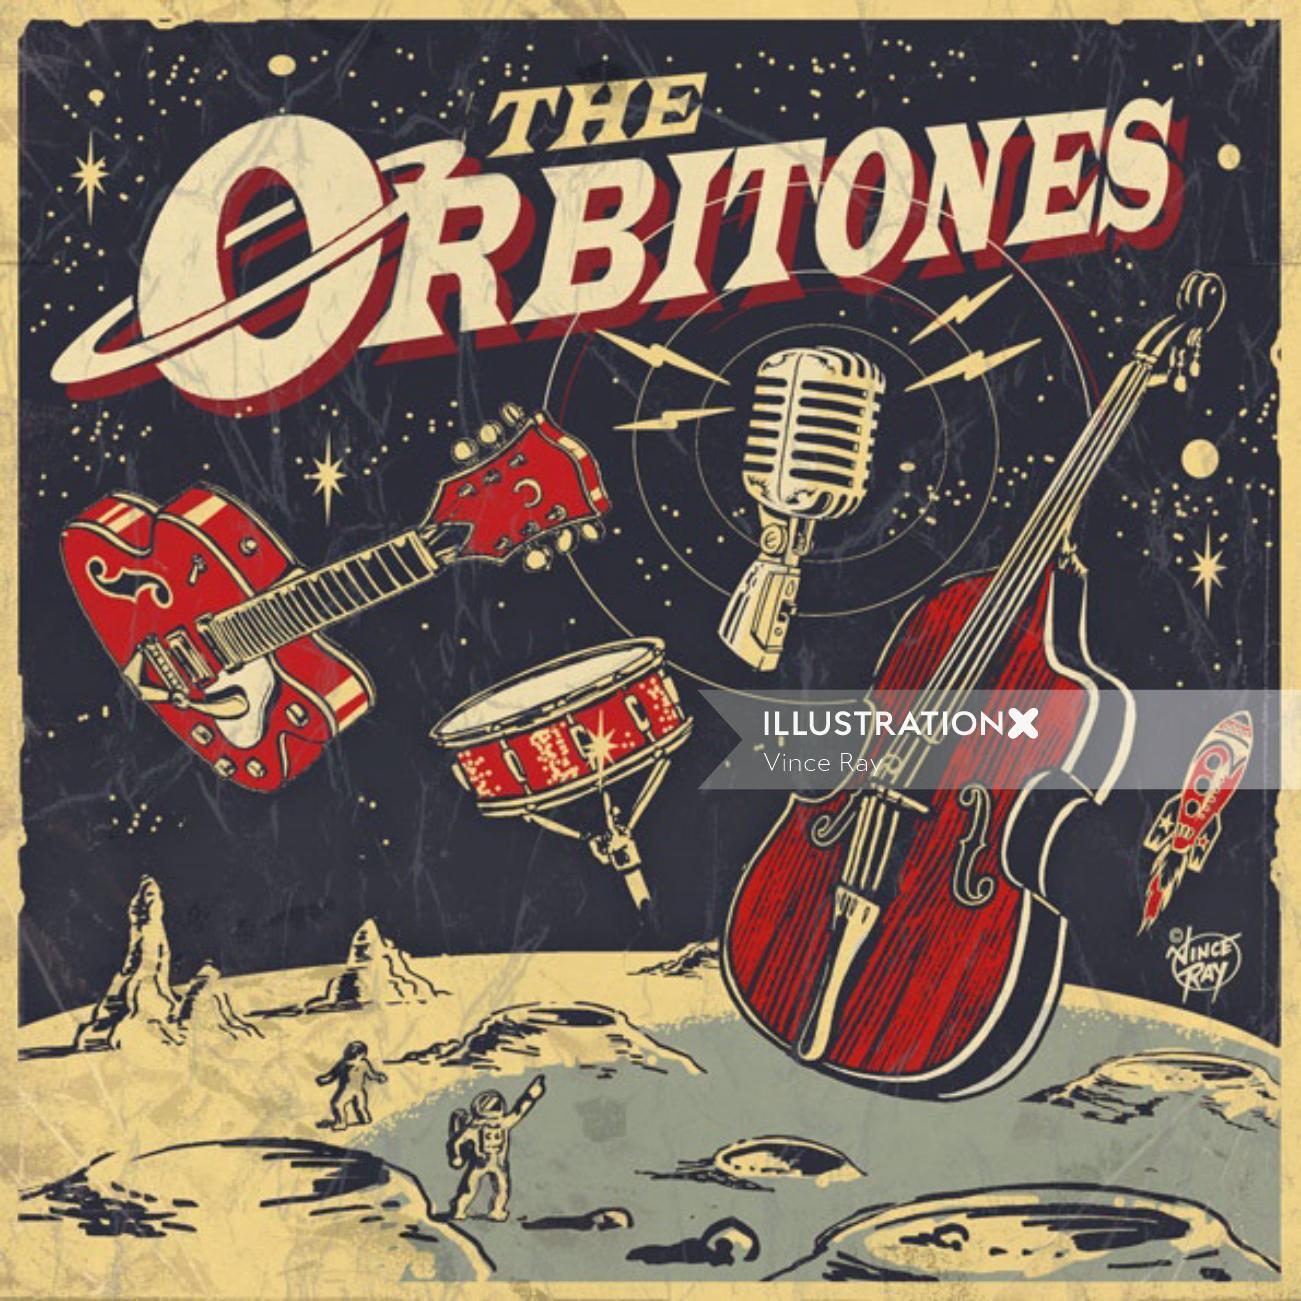 The orbitones lettering art